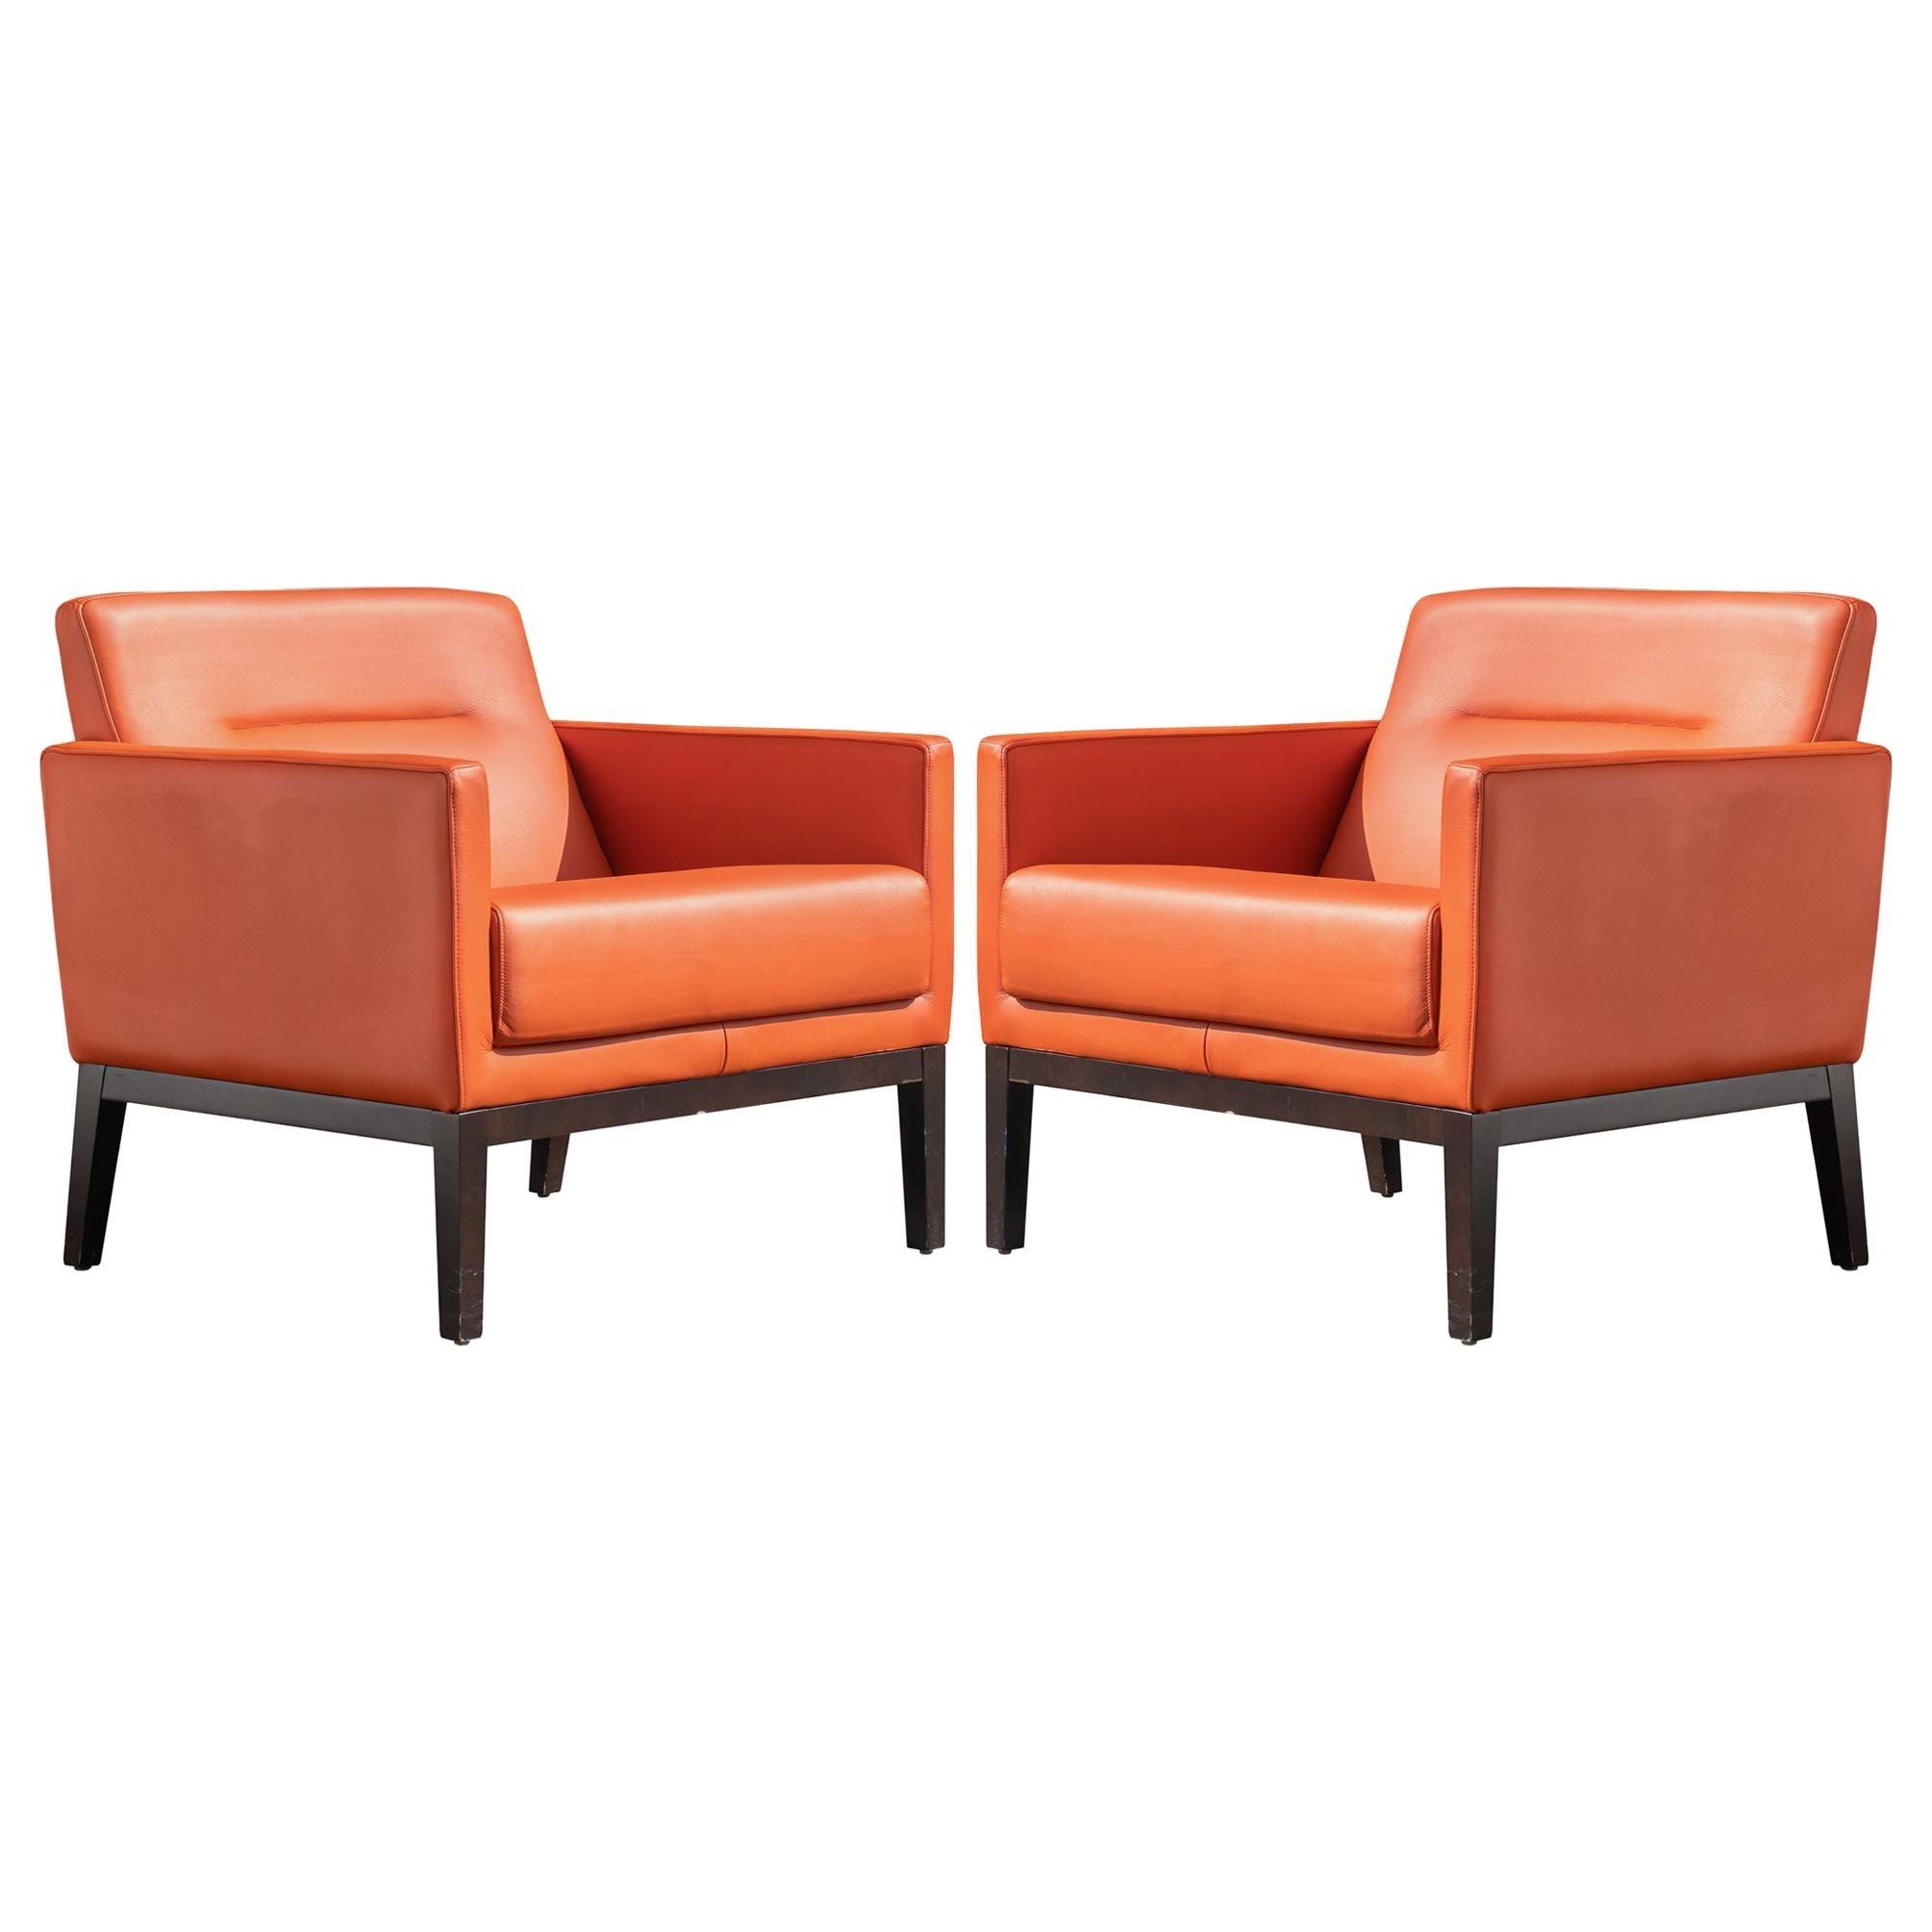 Brayton International Club Chairs in Orange Leather, Pair